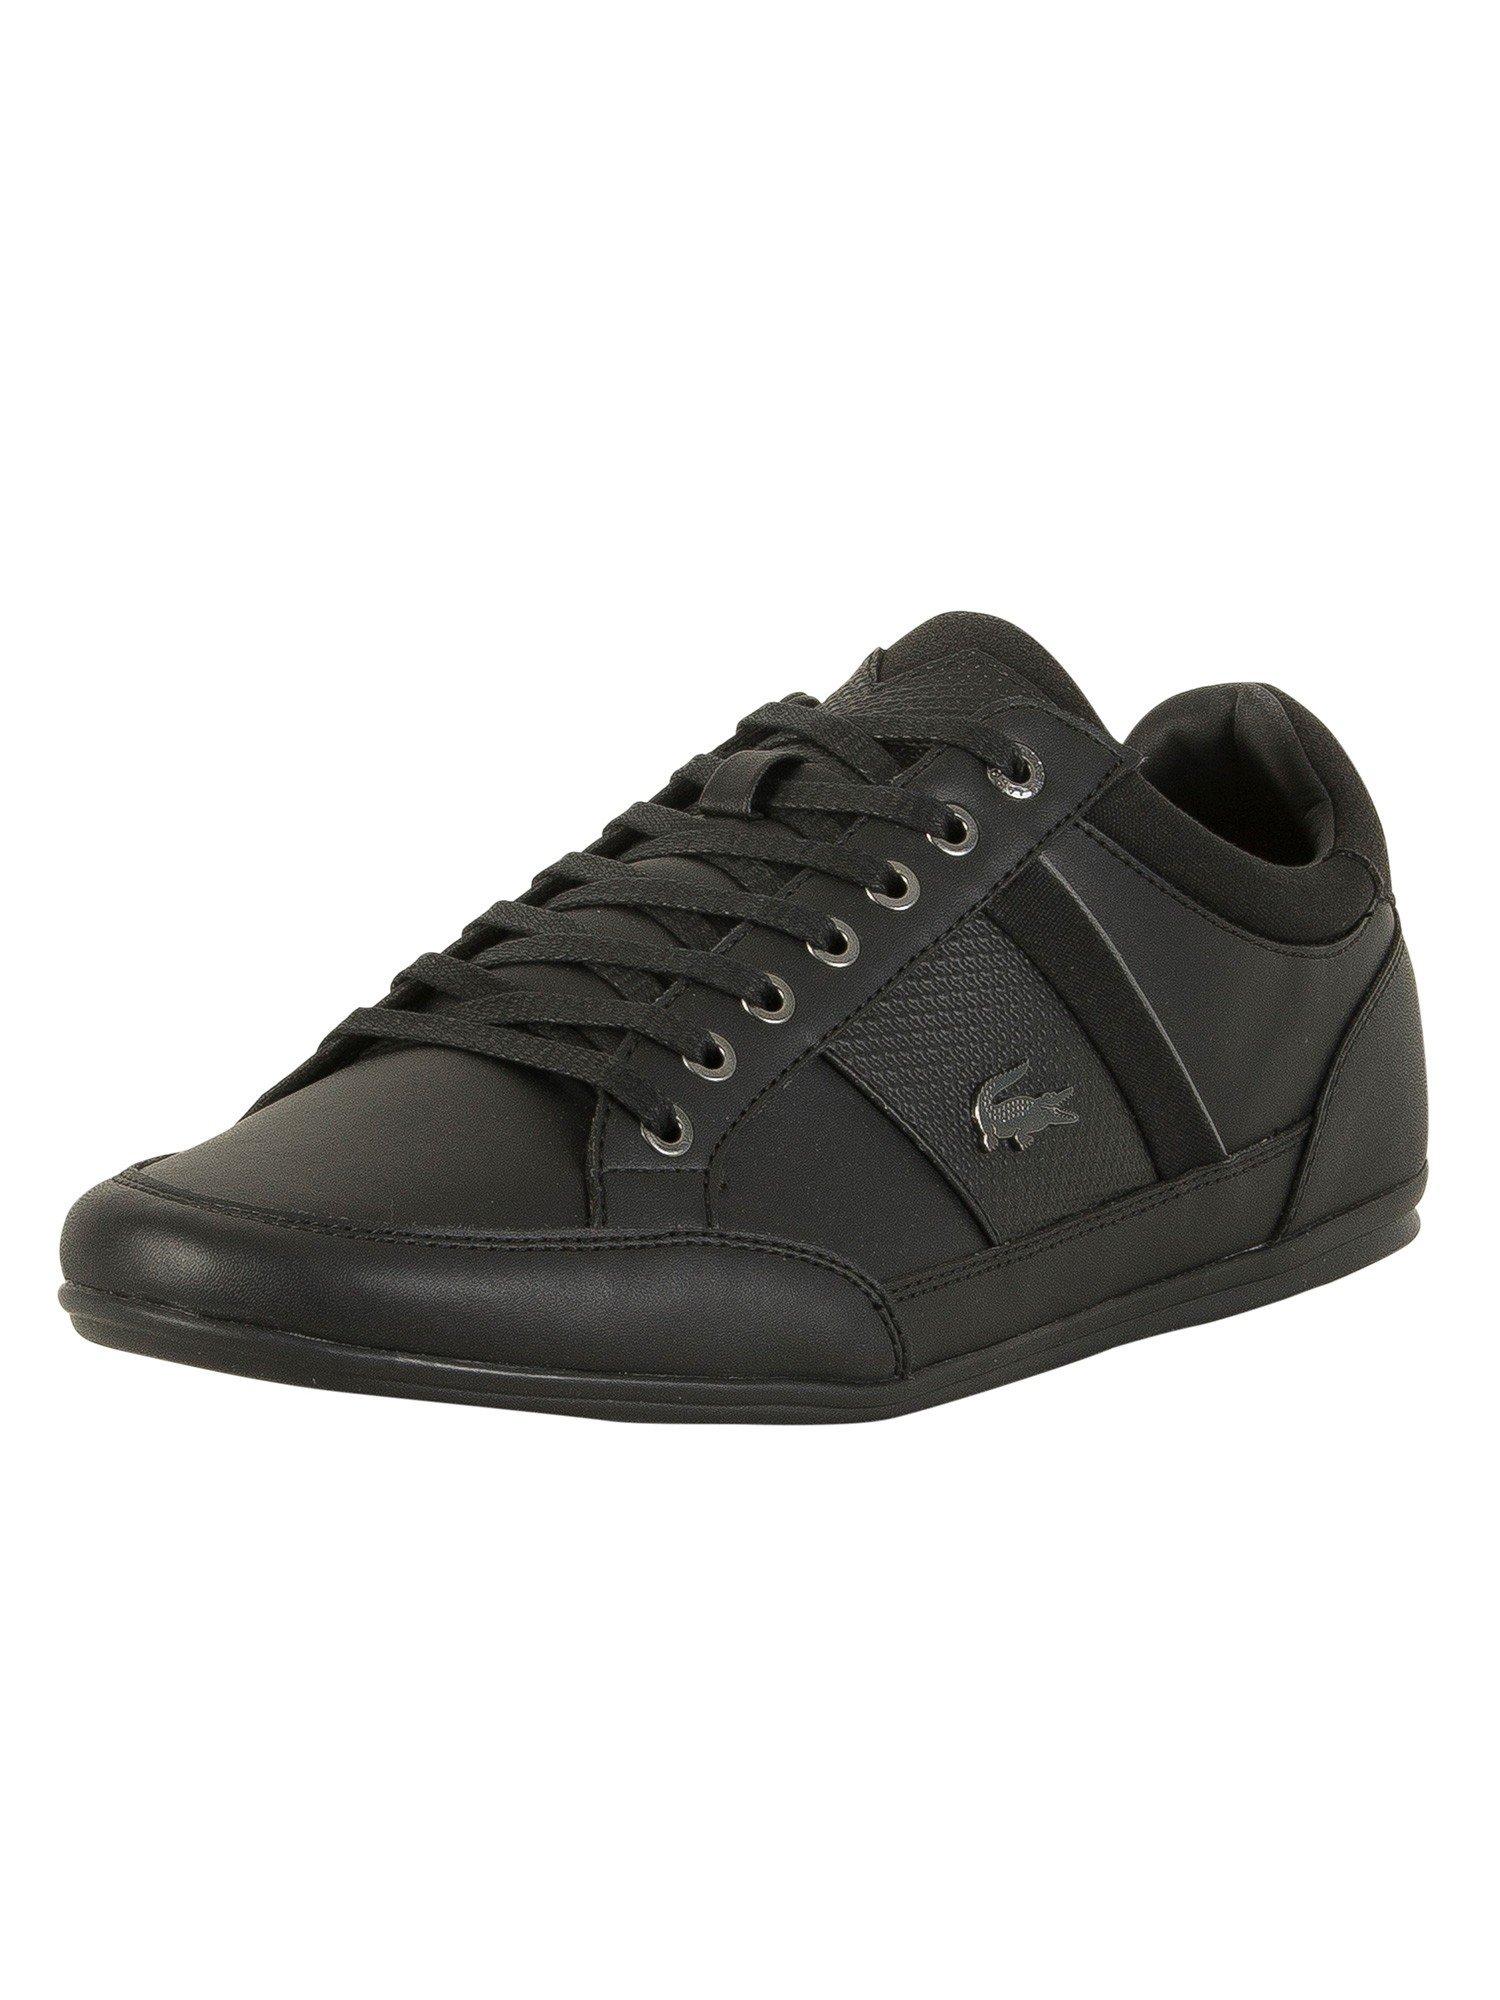 Lacoste Men's Chaymon 118 1 Cam Leather Trainers, Black, 9 US